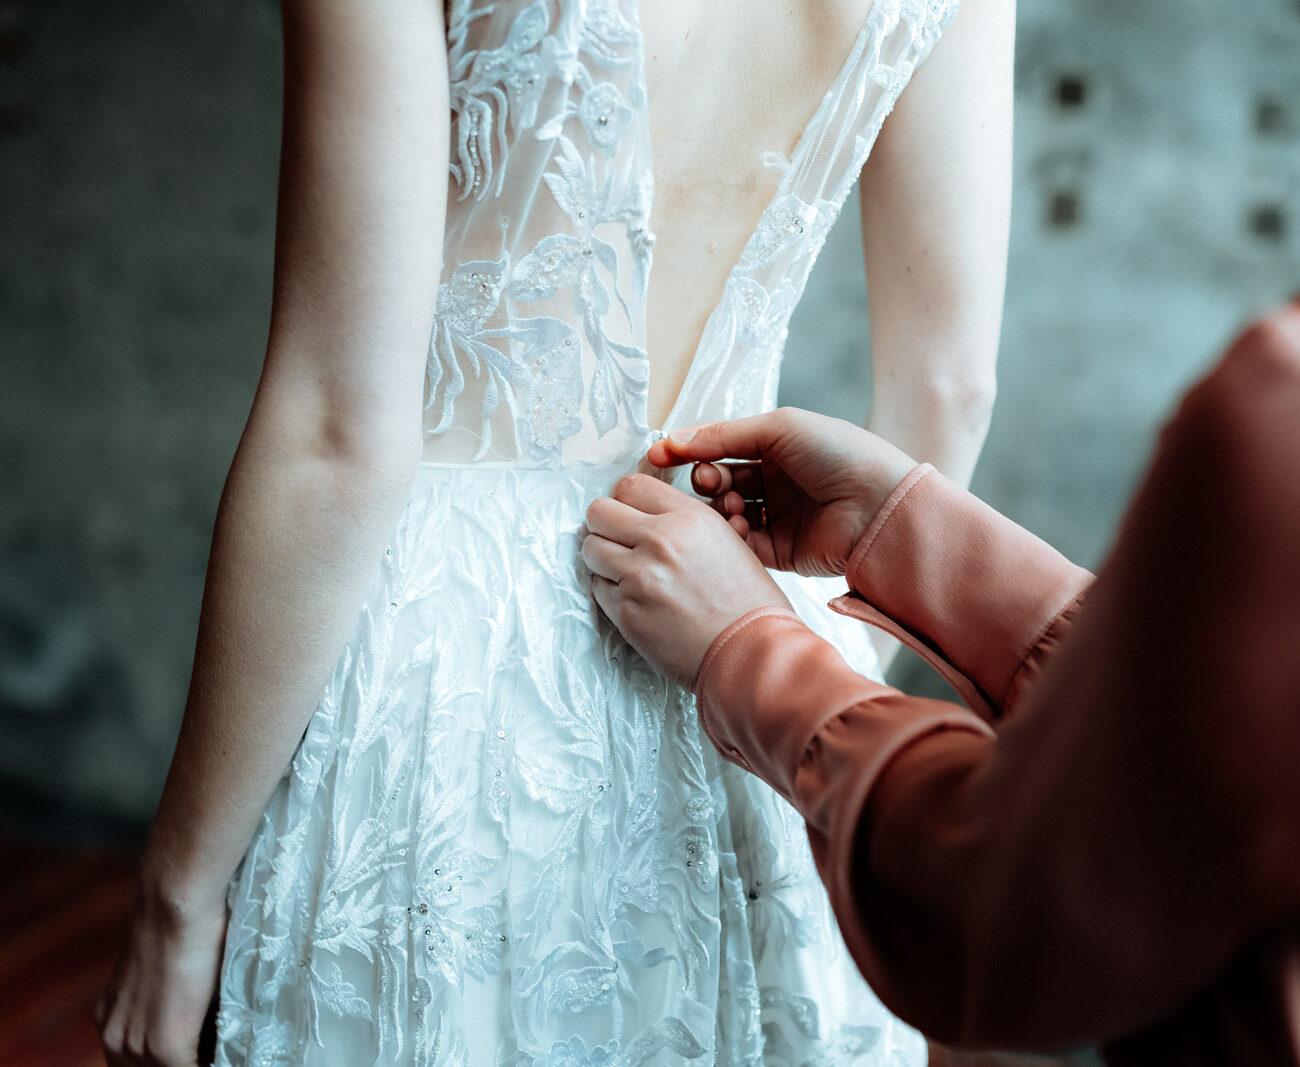 hochzeitsfotograf stuttgart berlin weddingphotographer